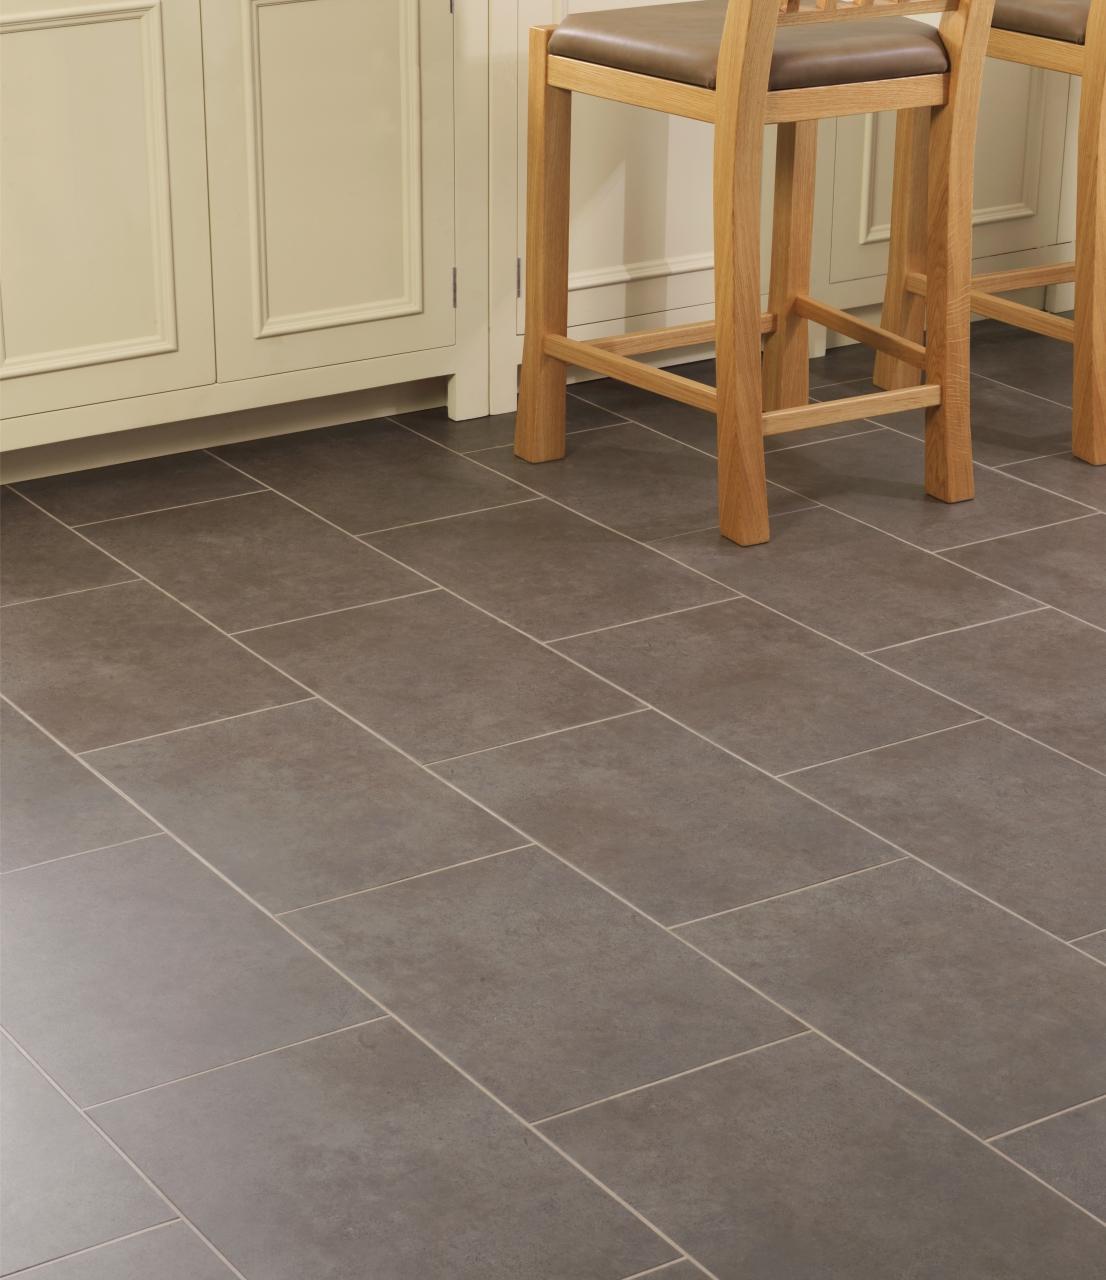 ceramic sable beautifully designed lvt flooring from the amtico spacia collection luxury vinyl flooring u0026 tiles design flooring by amtico